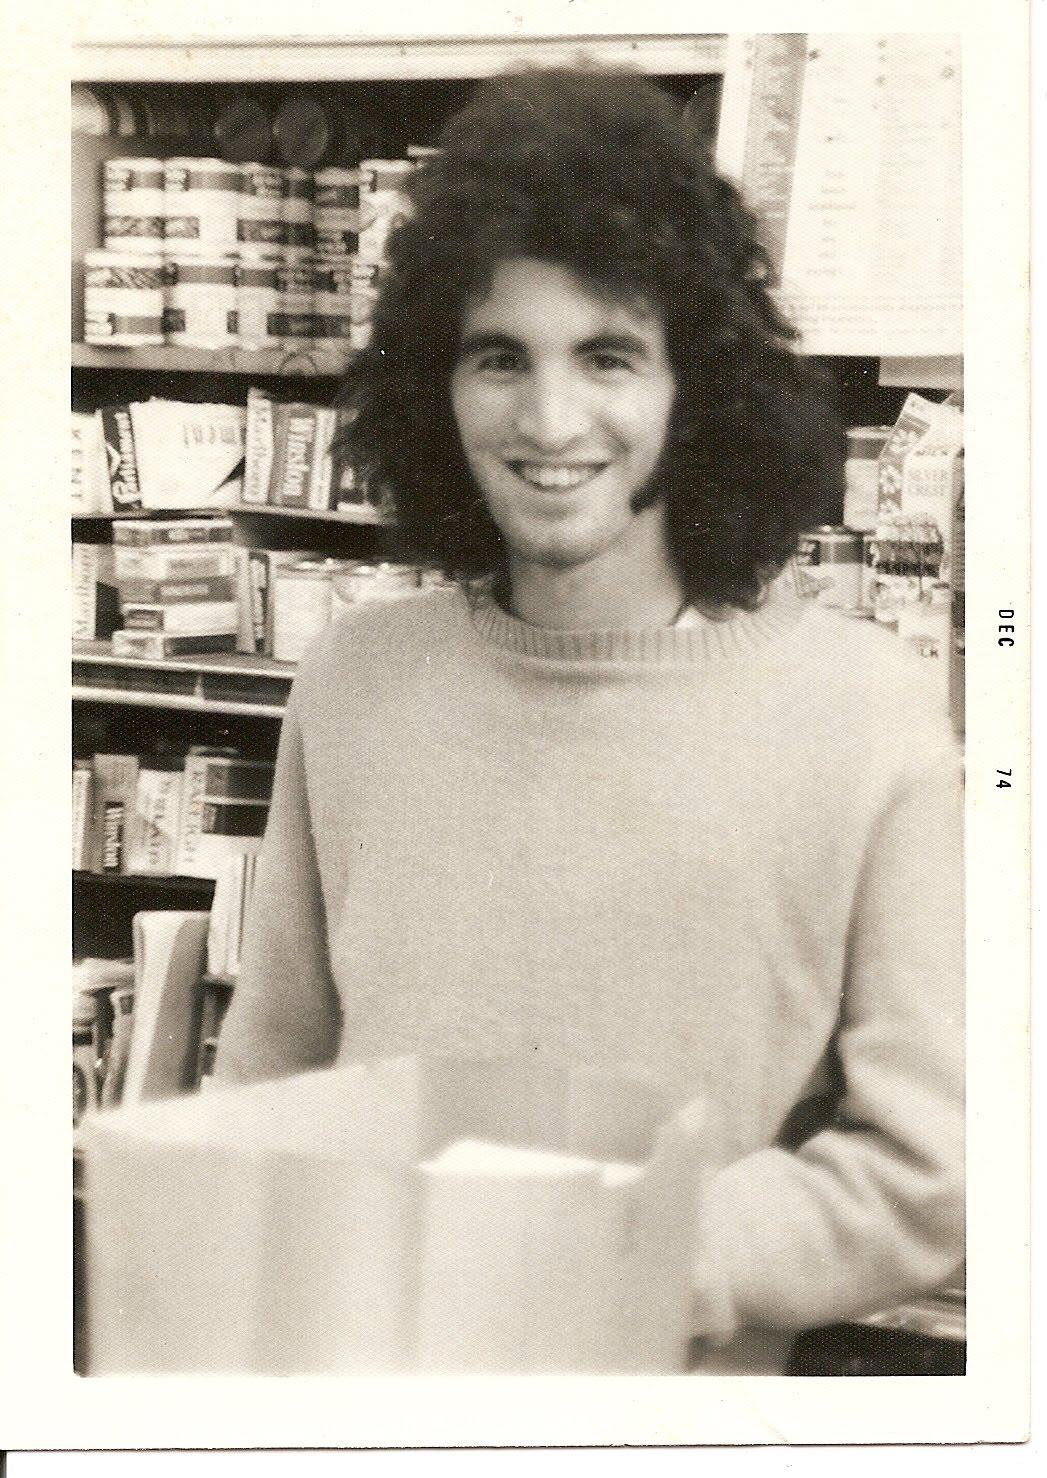 http://3.bp.blogspot.com/_DBRC1JjTZgA/TKOK4HMFy0I/AAAAAAAABs8/MOavIinRWwA/s1600/Robert+at+H+and+A+Foods+1974.jpg